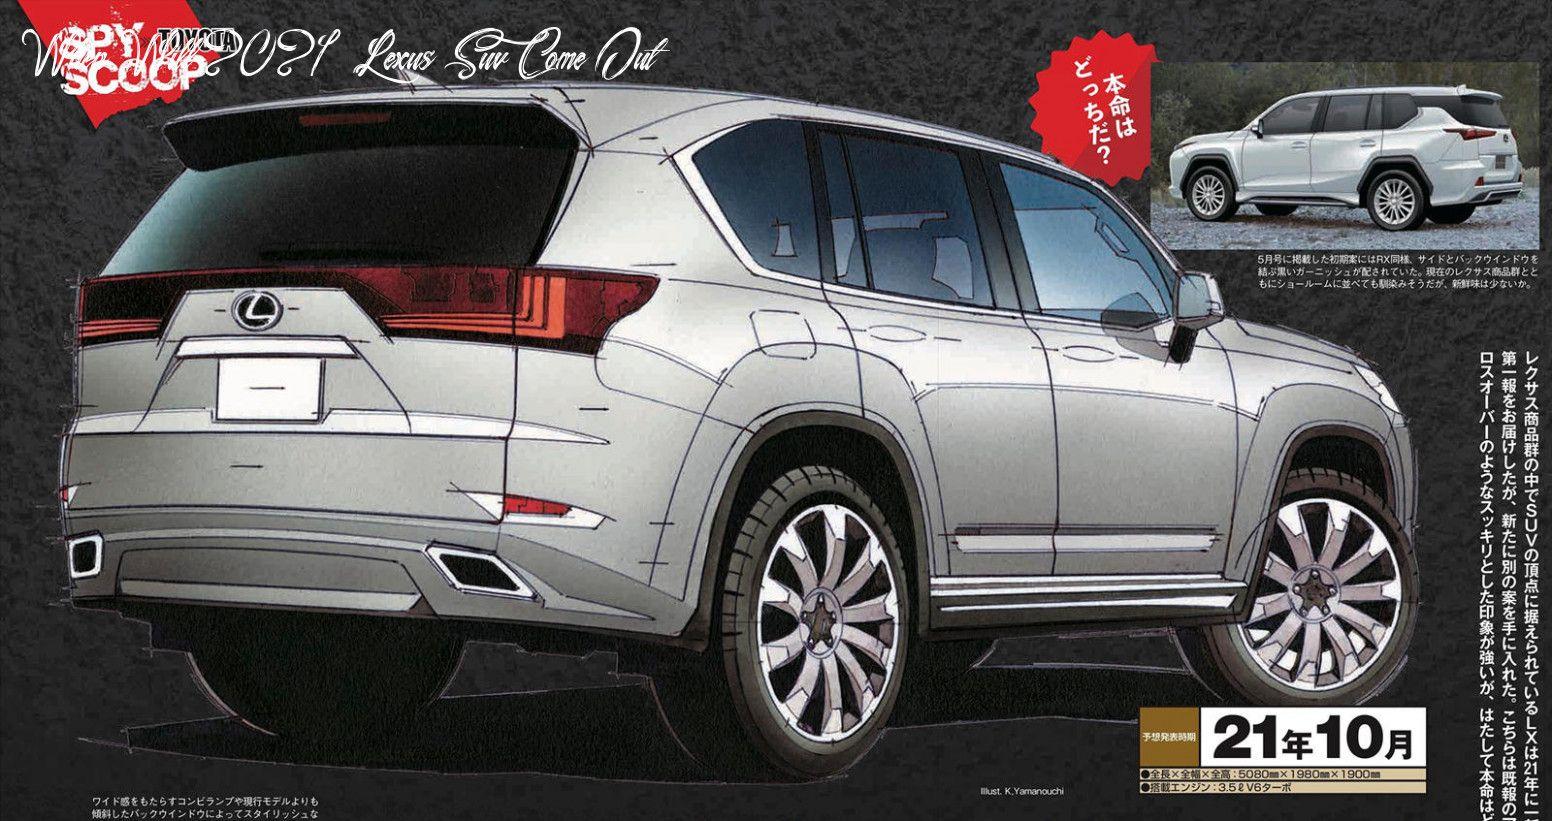 When Will 2021 Lexus Suv Come Out First Drive In 2020 Lexus Suv Lexus Truck Lexus Gx